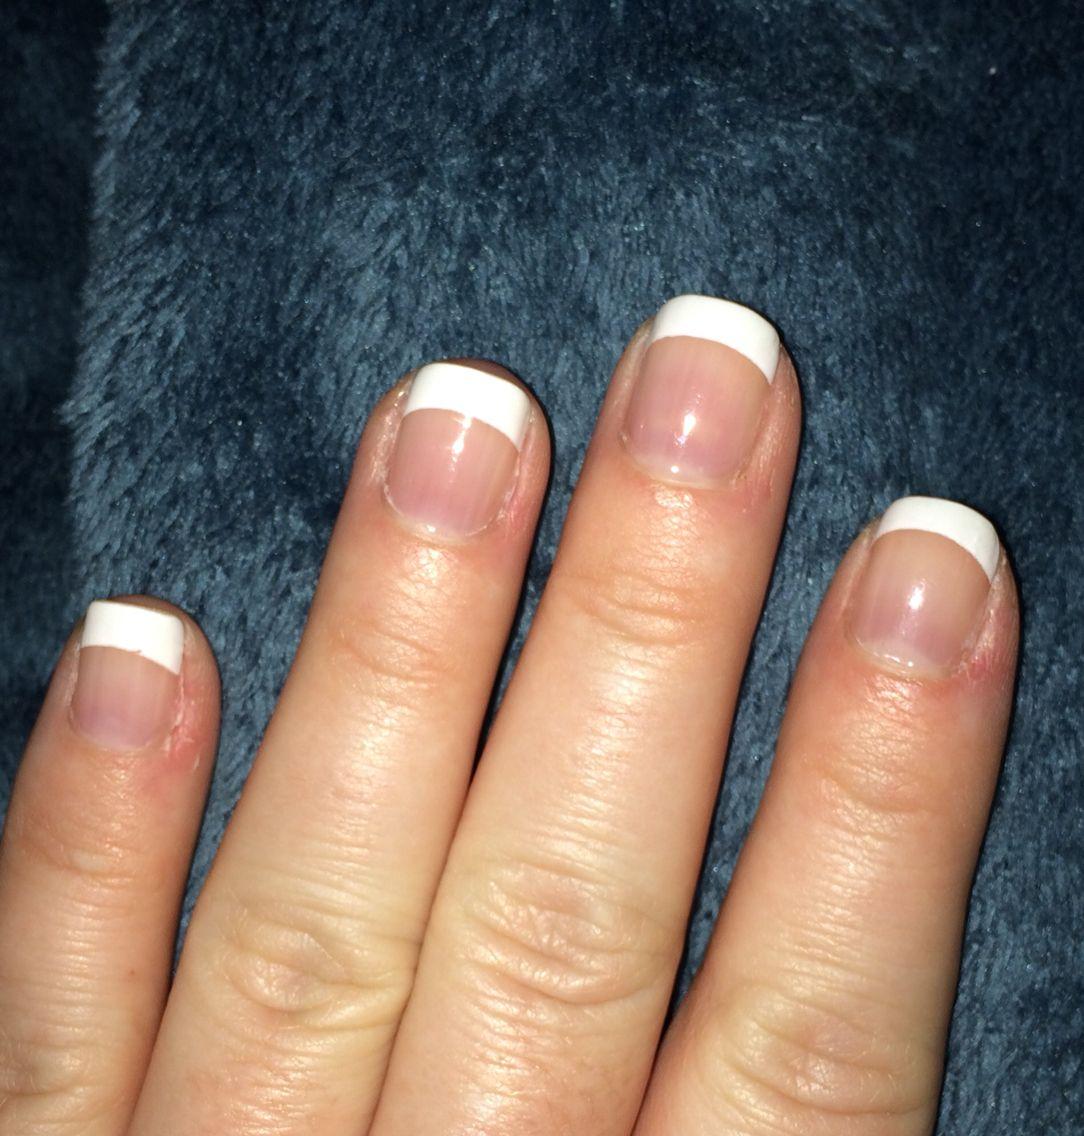 Sensationail French Manicure White Tips Peel And Stick So Easy Nail Art Manicure French Manicure